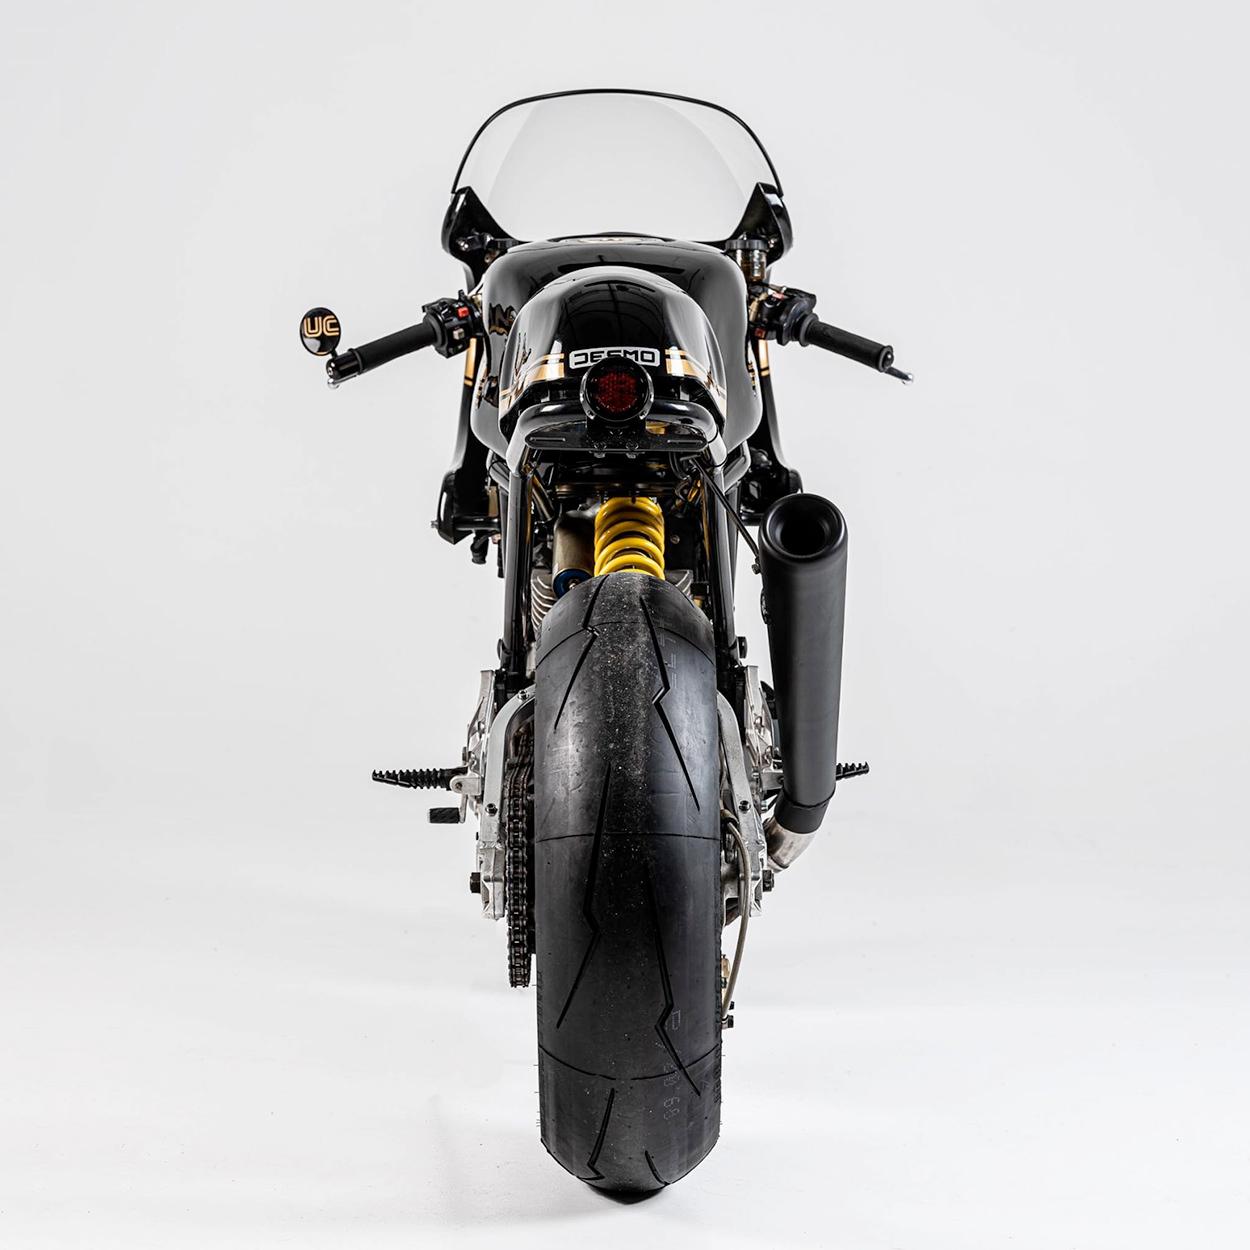 Ducati 900 Supersport Darmah tribute